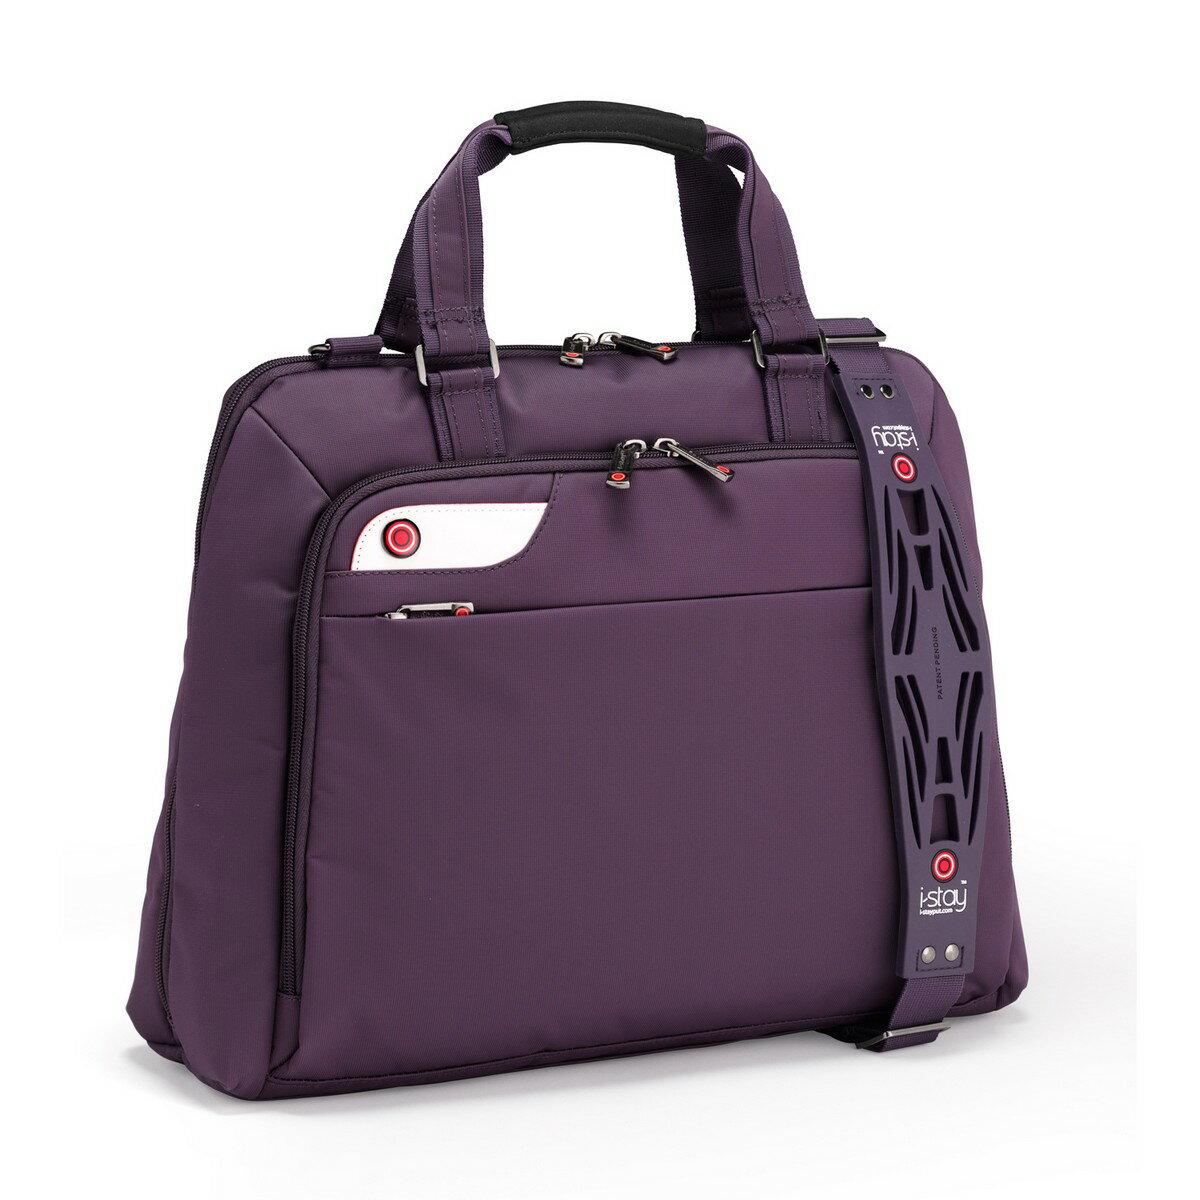 iStay Ladies Non-Slip Laptop Bag 15.6 inch (purple) 0